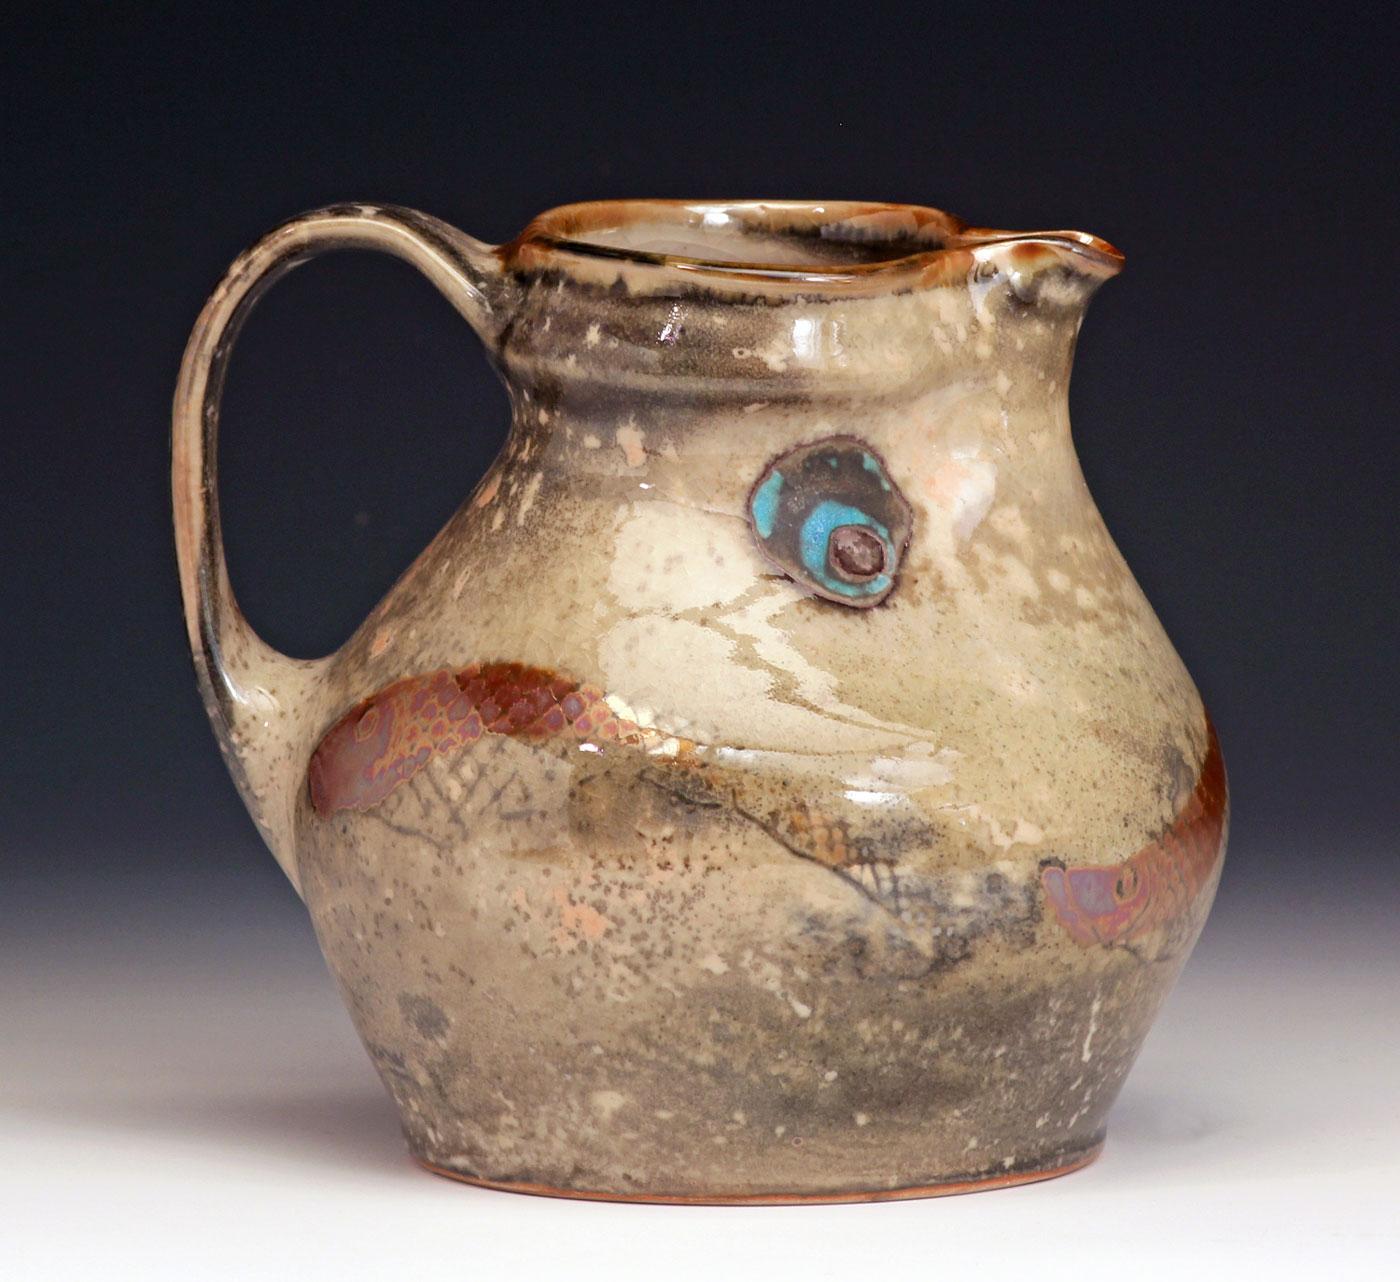 Fine-Ceramics-Bruce-Gholson-Pitcher-Bulldog-Pottery.jpg